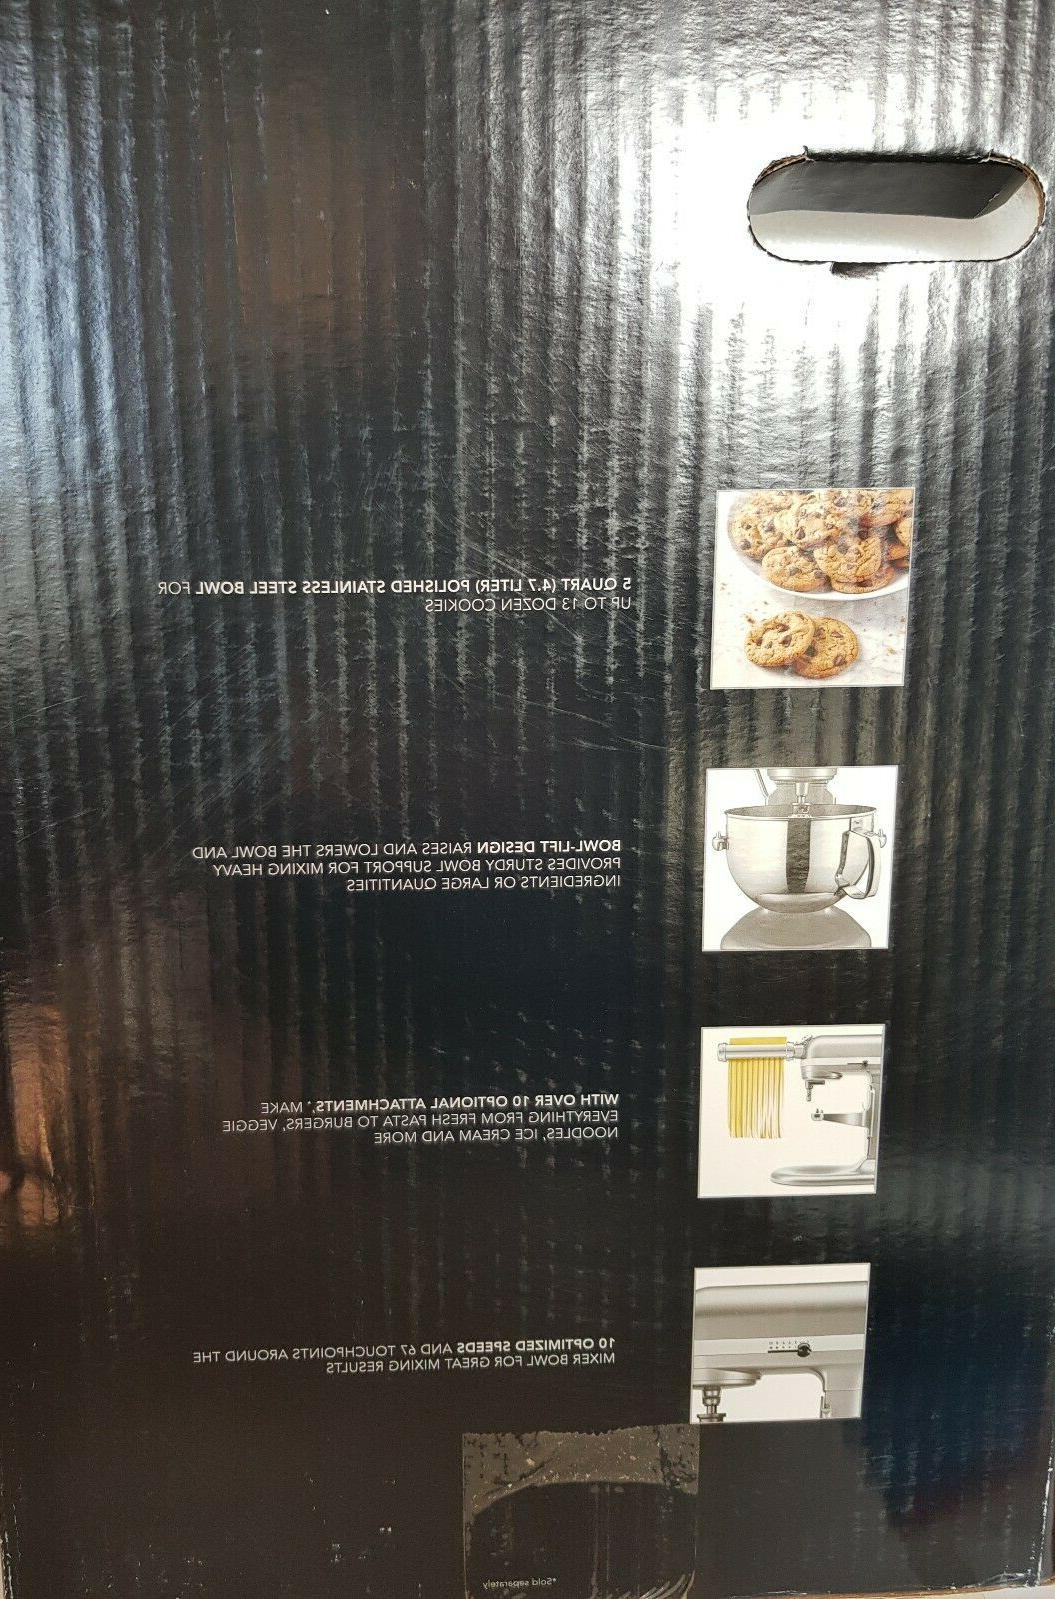 KitchenAid Bowl-Lift Stand Mixer with Bonus Accessories New